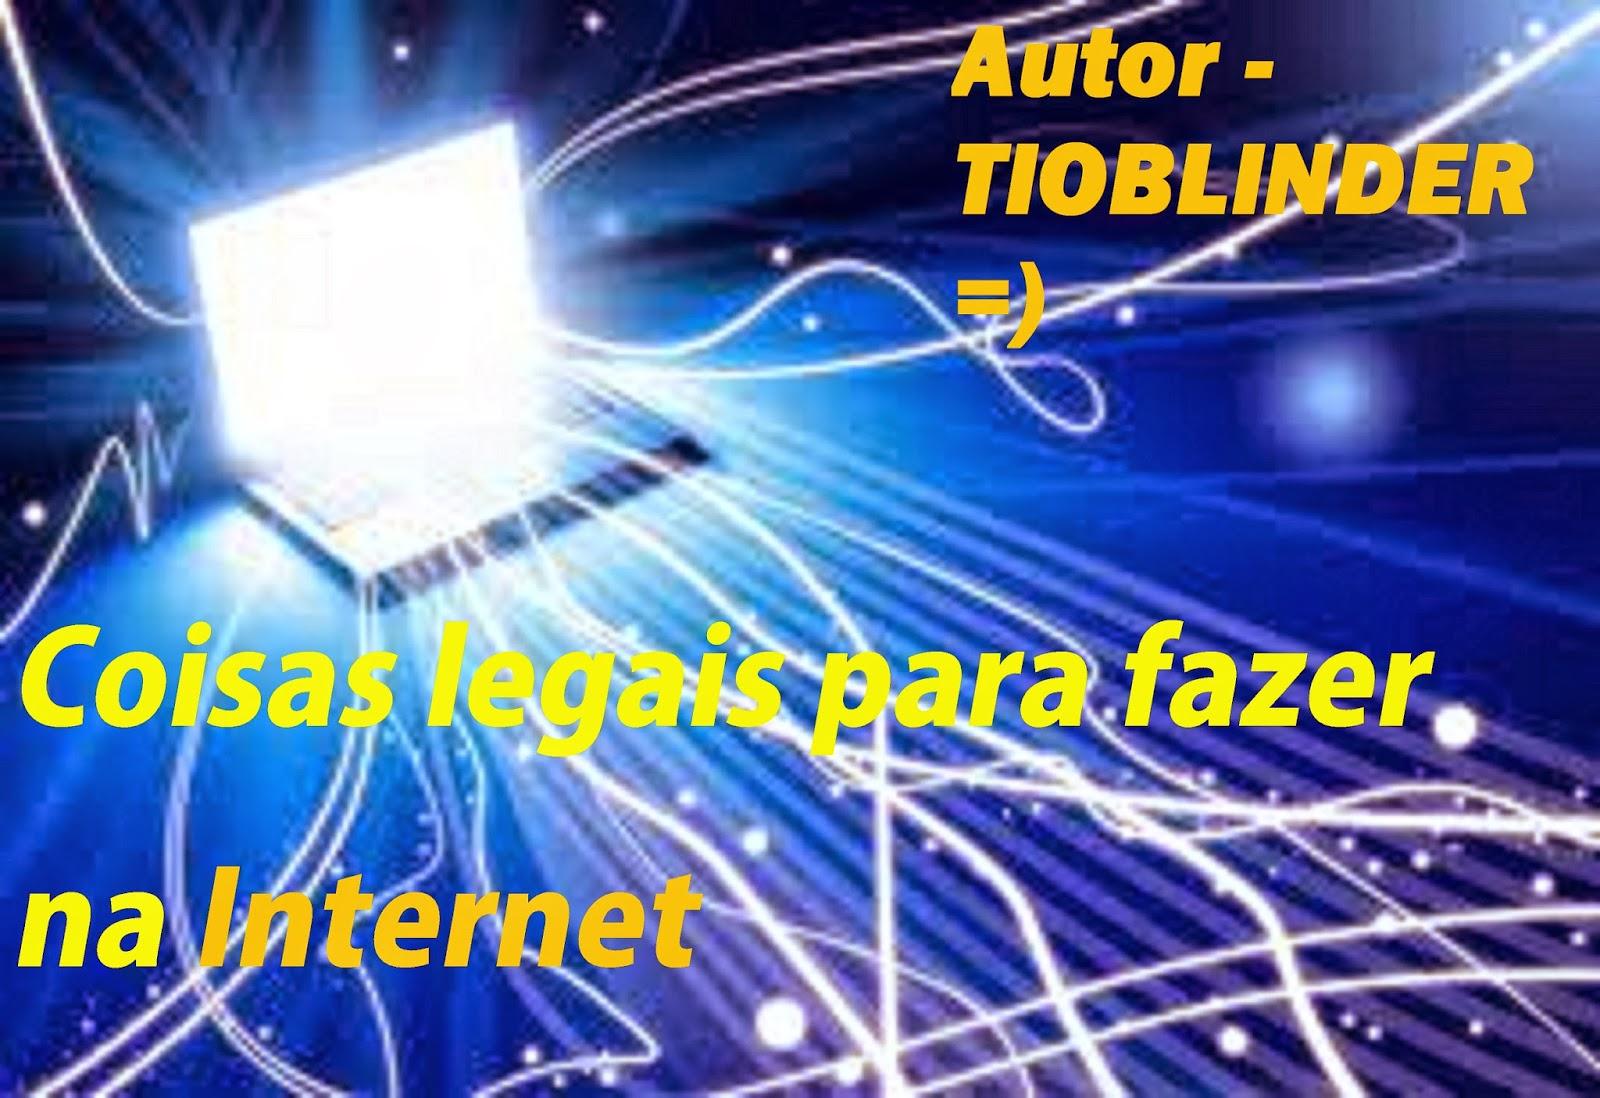 Tio Blinder: <b>Coisas</b> legais para <b>fazer</b> na <b>internet</b> 2014